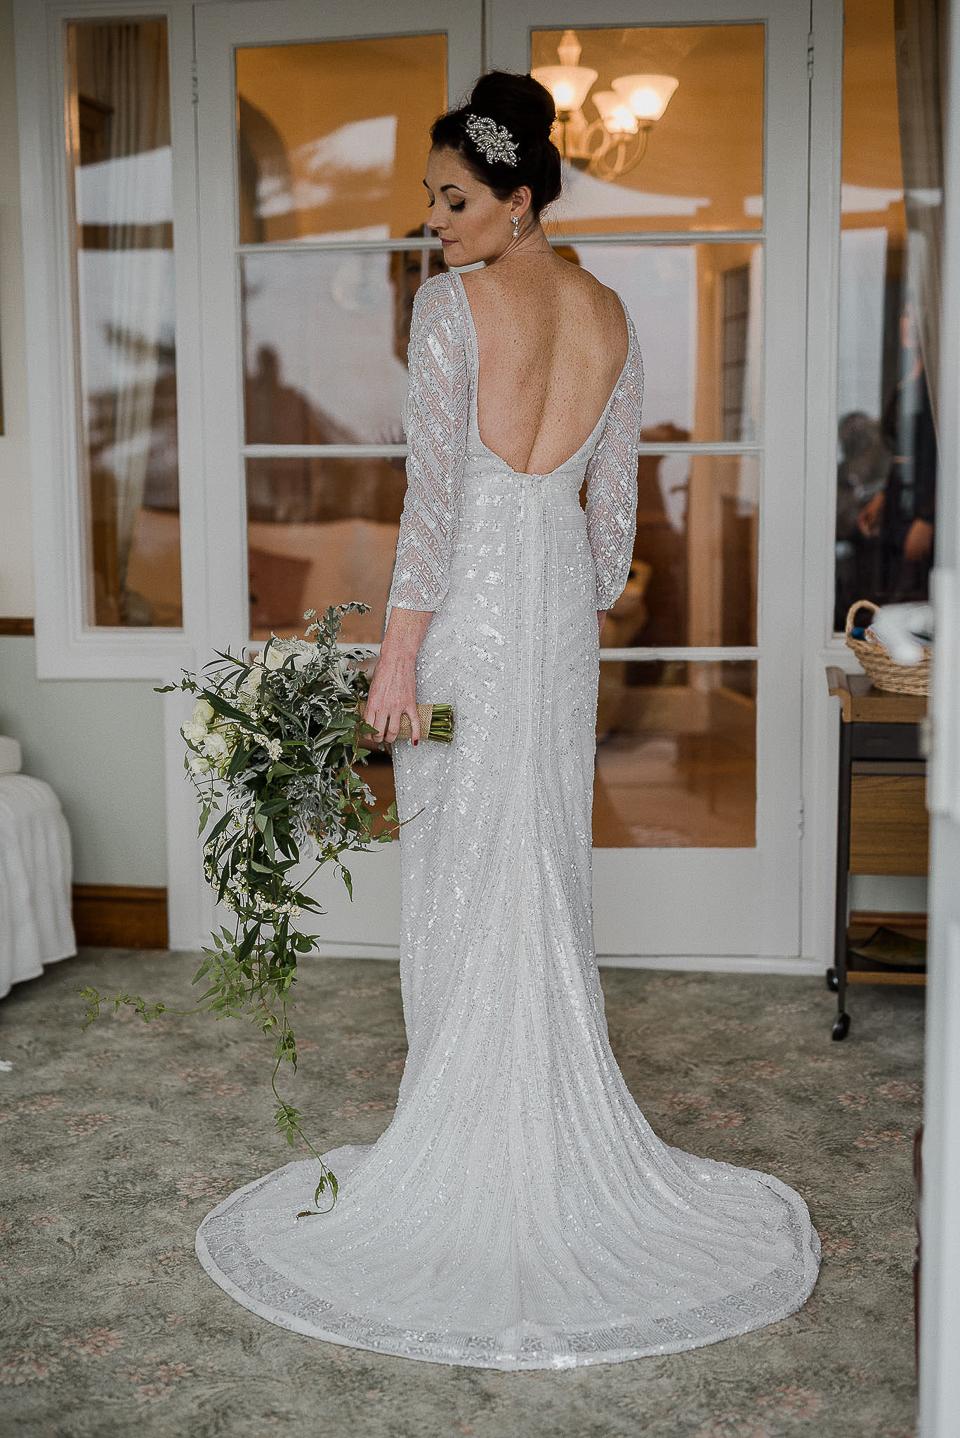 best-wedding-photographer-cornwall-2017-94.jpg